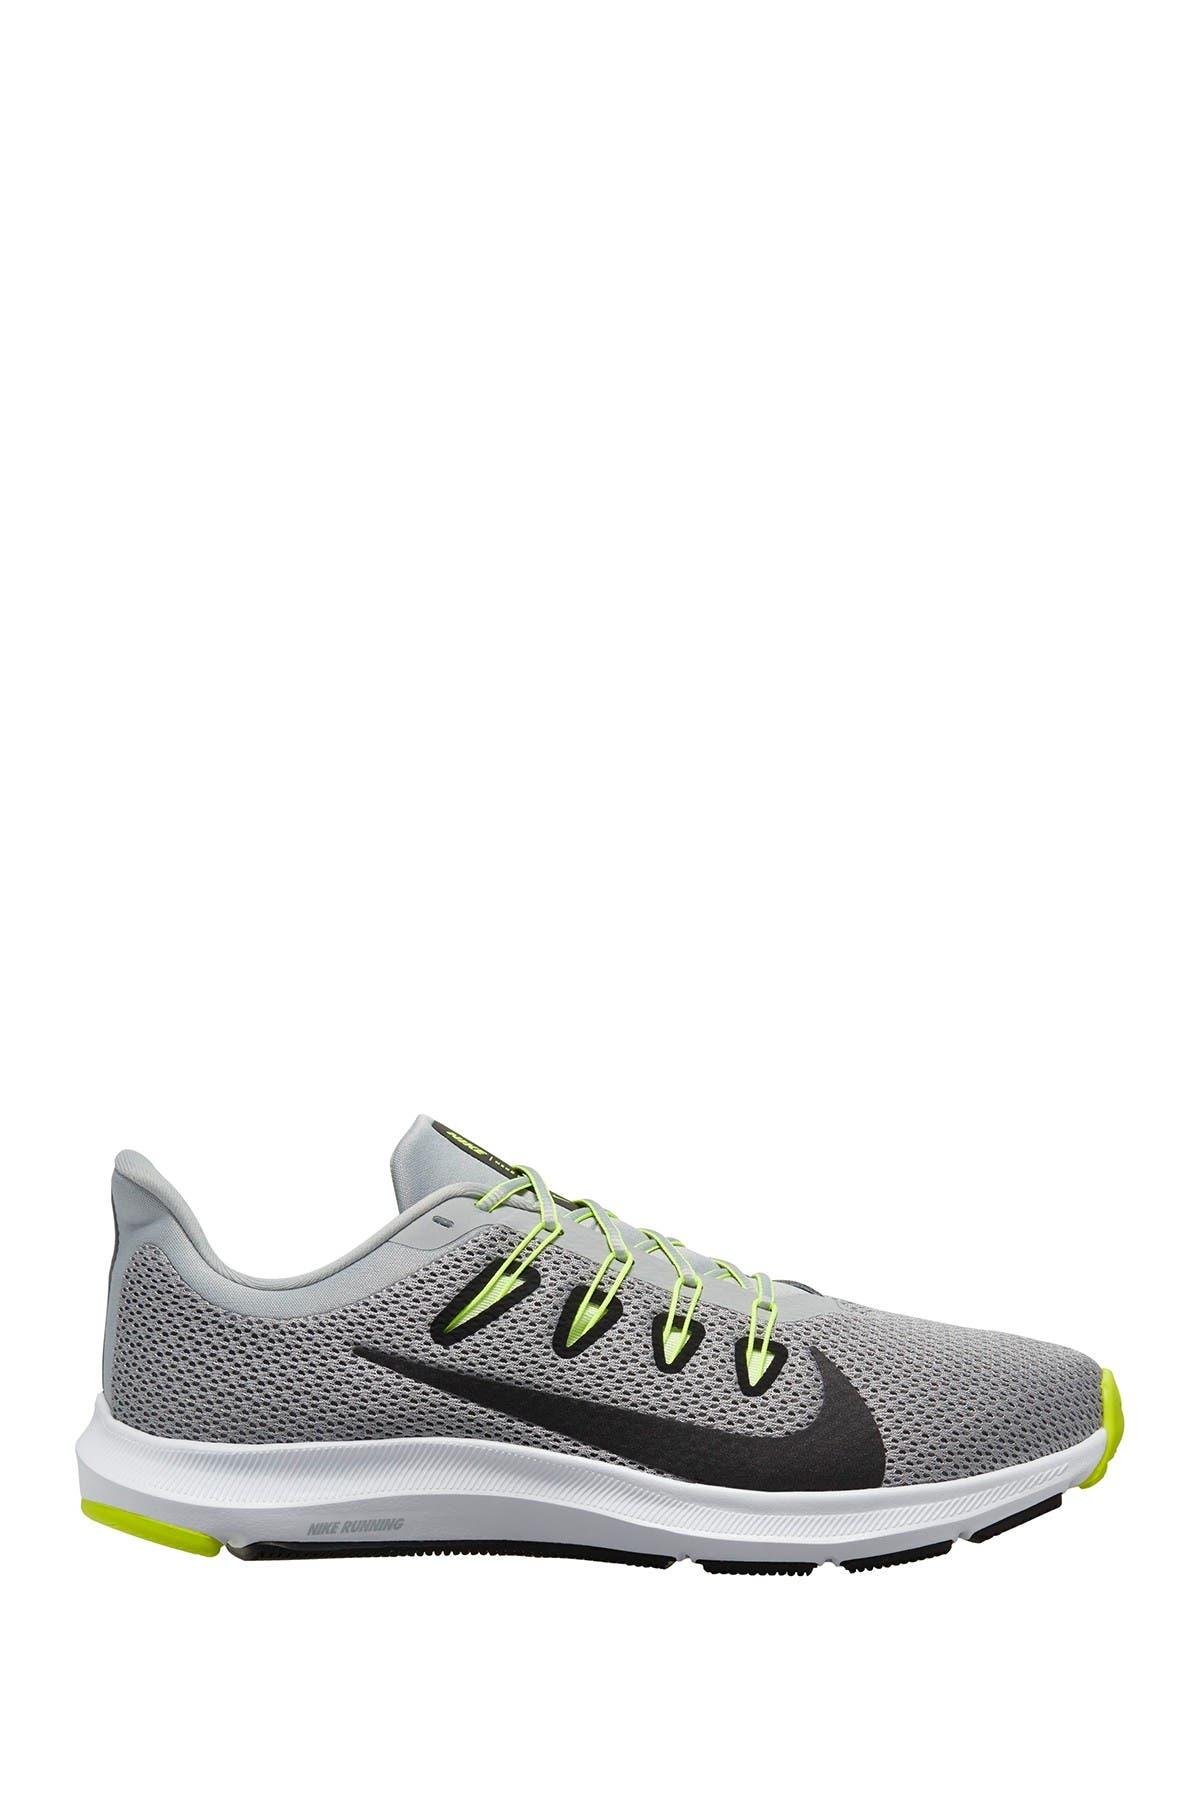 Nike | Quest 2 Running Shoe | Nordstrom